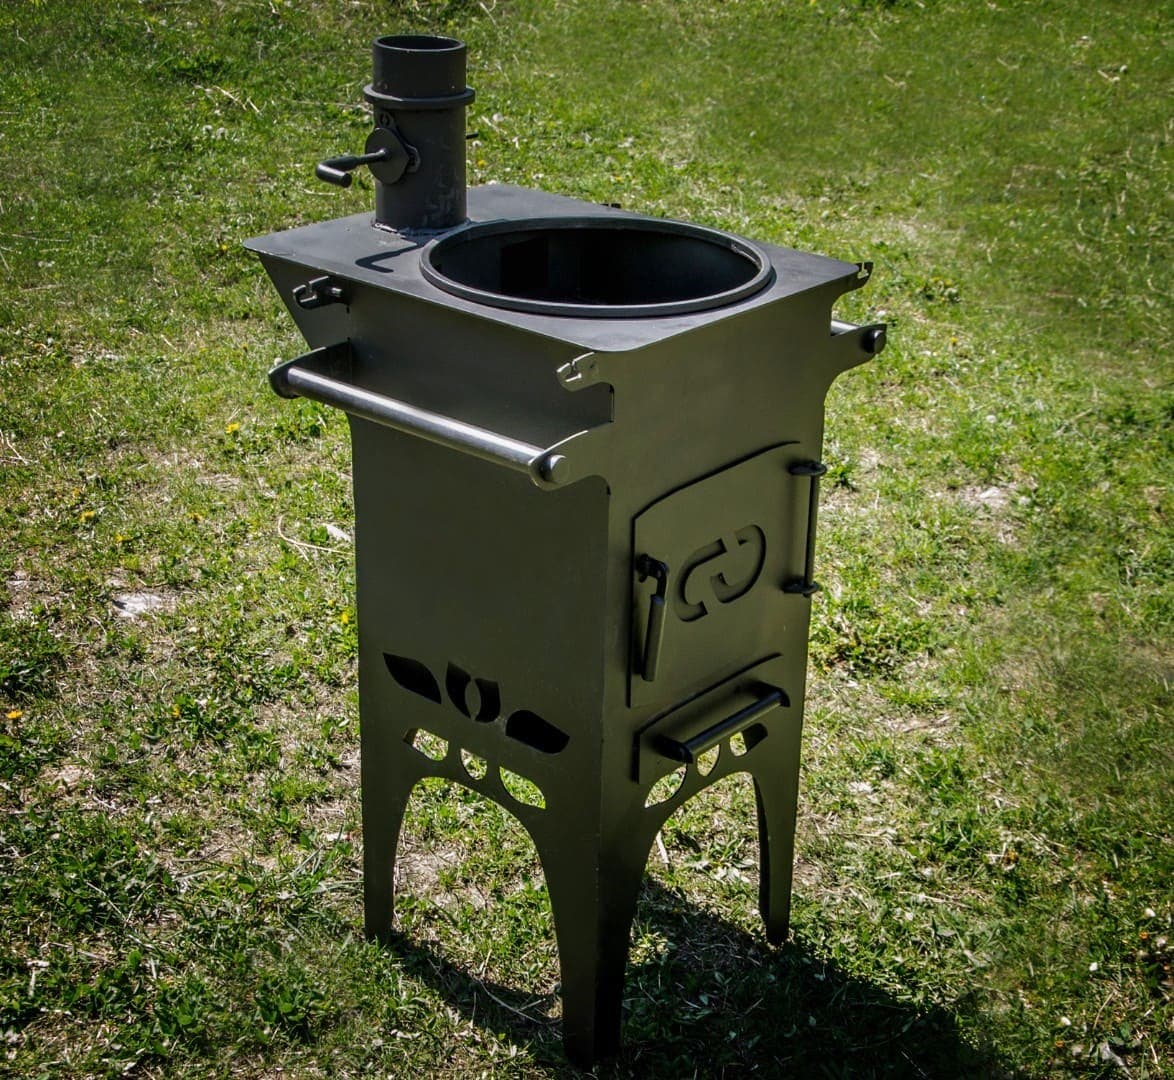 Печь для казана Гурман, под казан до 16 литров, термометр, сталь - 4 мм. - фото 10342